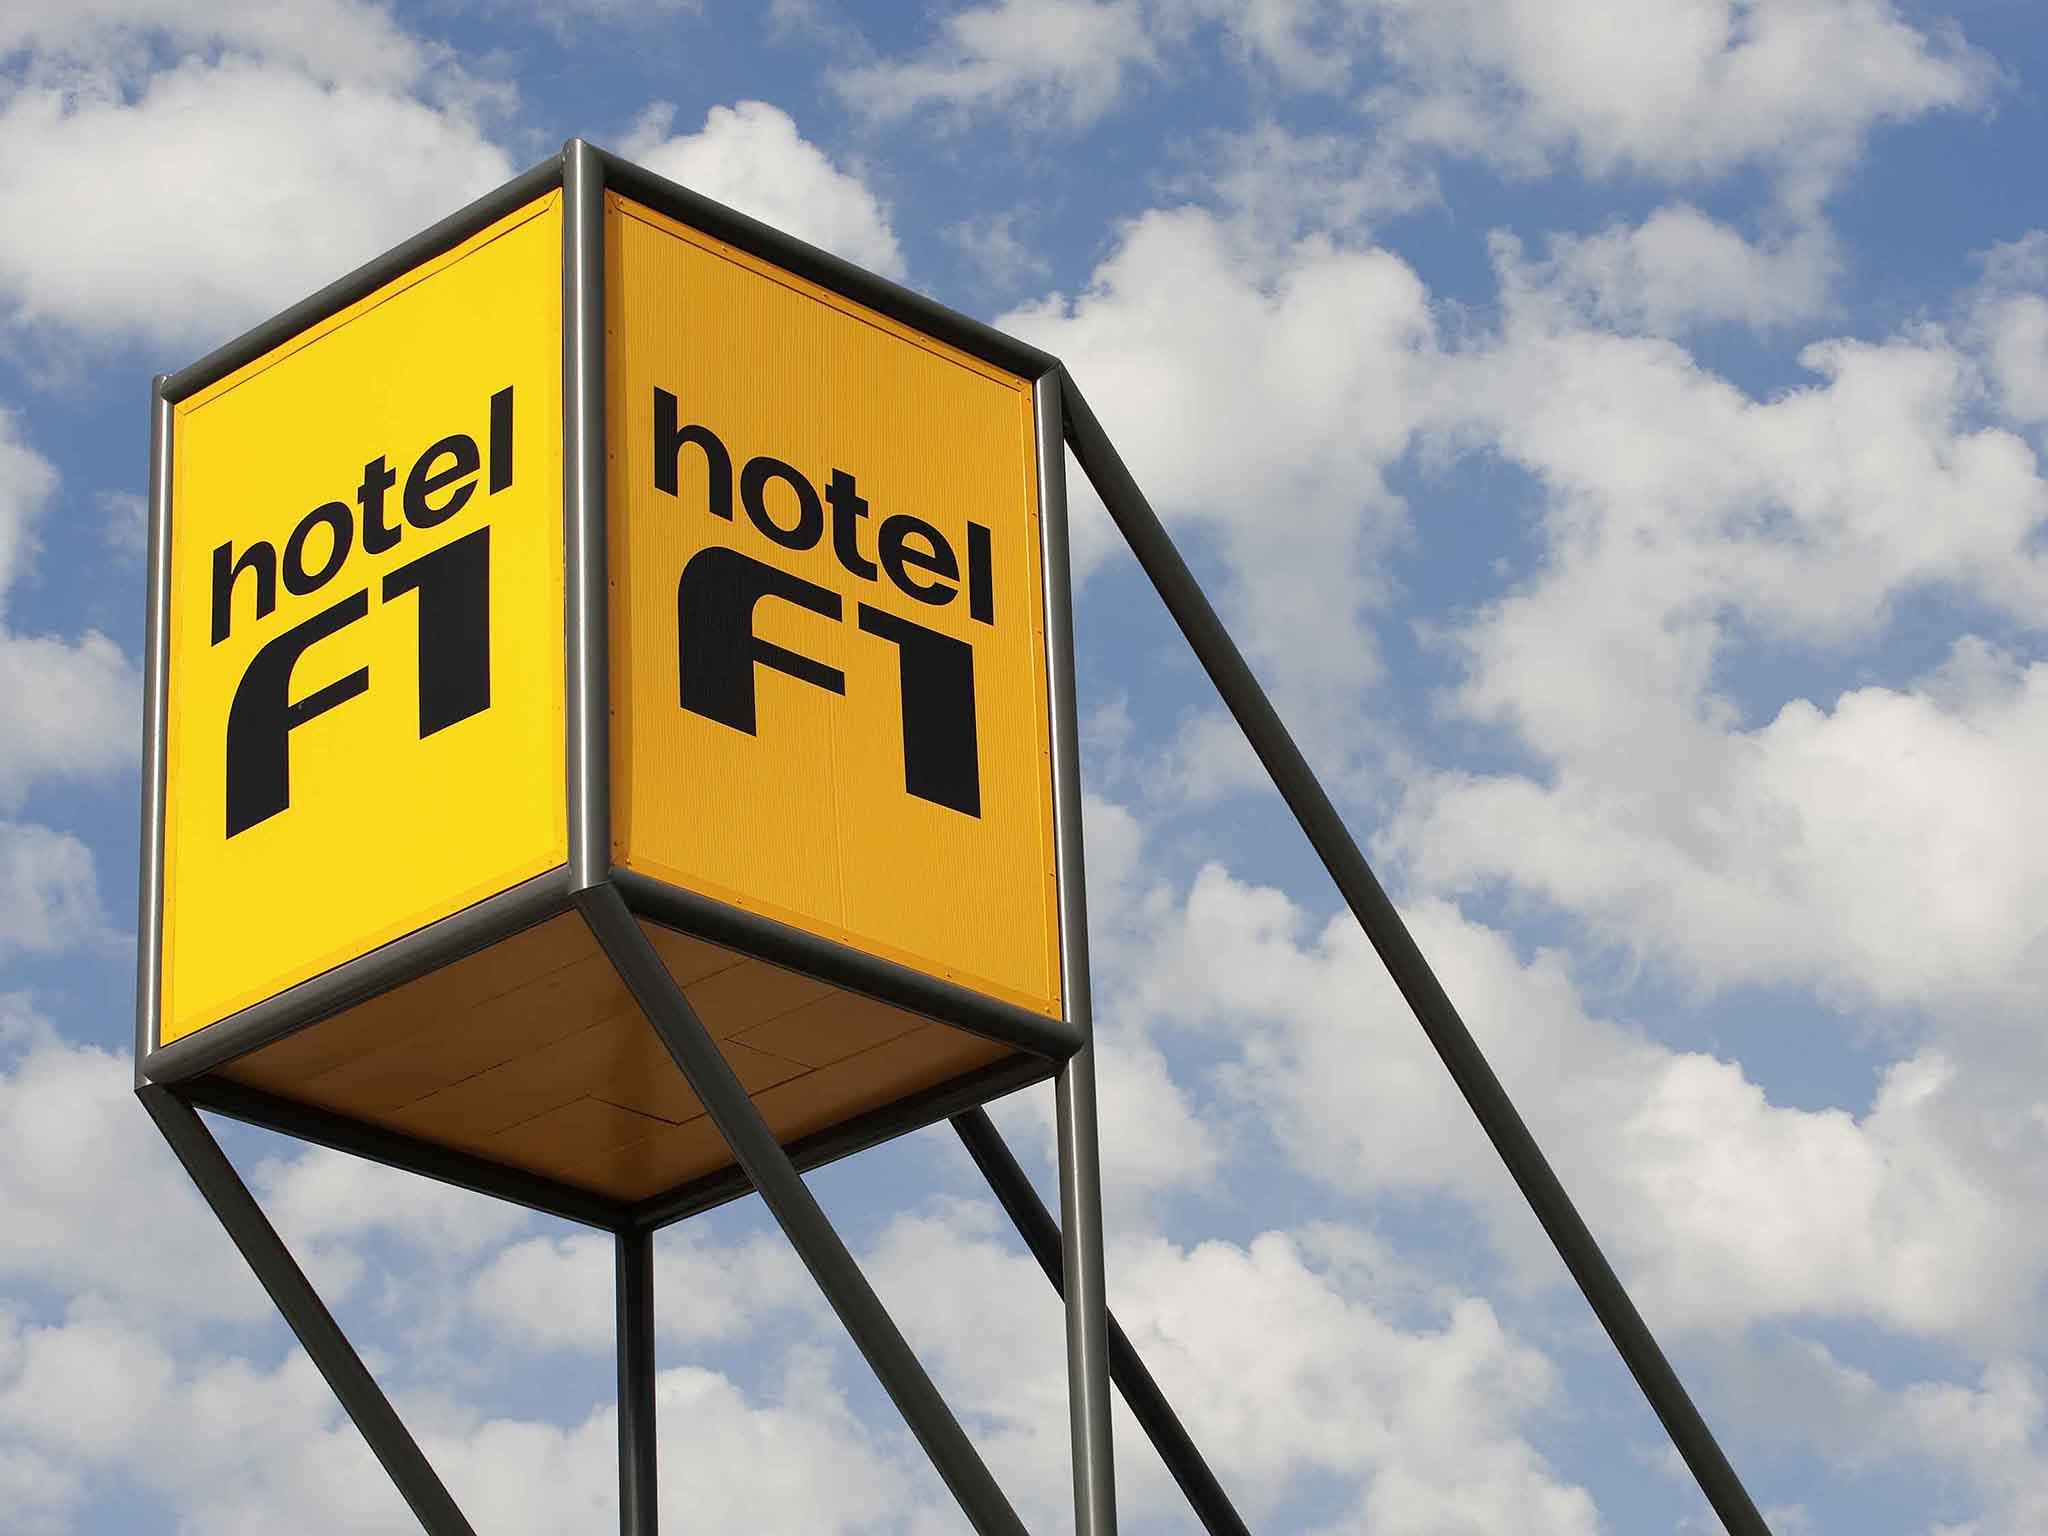 Otel – hotelF1 Fougères